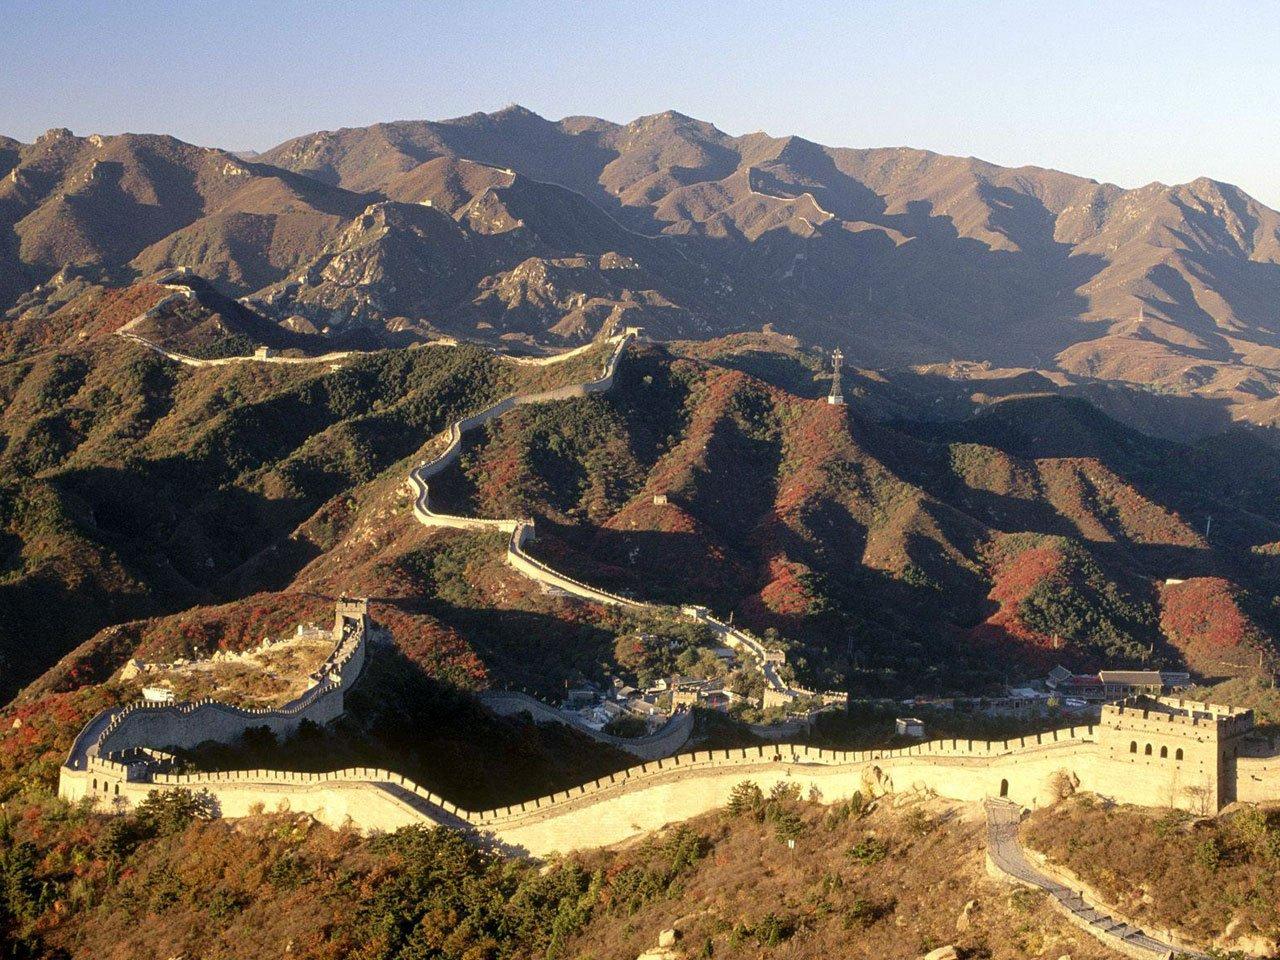 Фото Лента укреплений. Китай, Beijing Shi, Пекин, 216 Sheng Dao